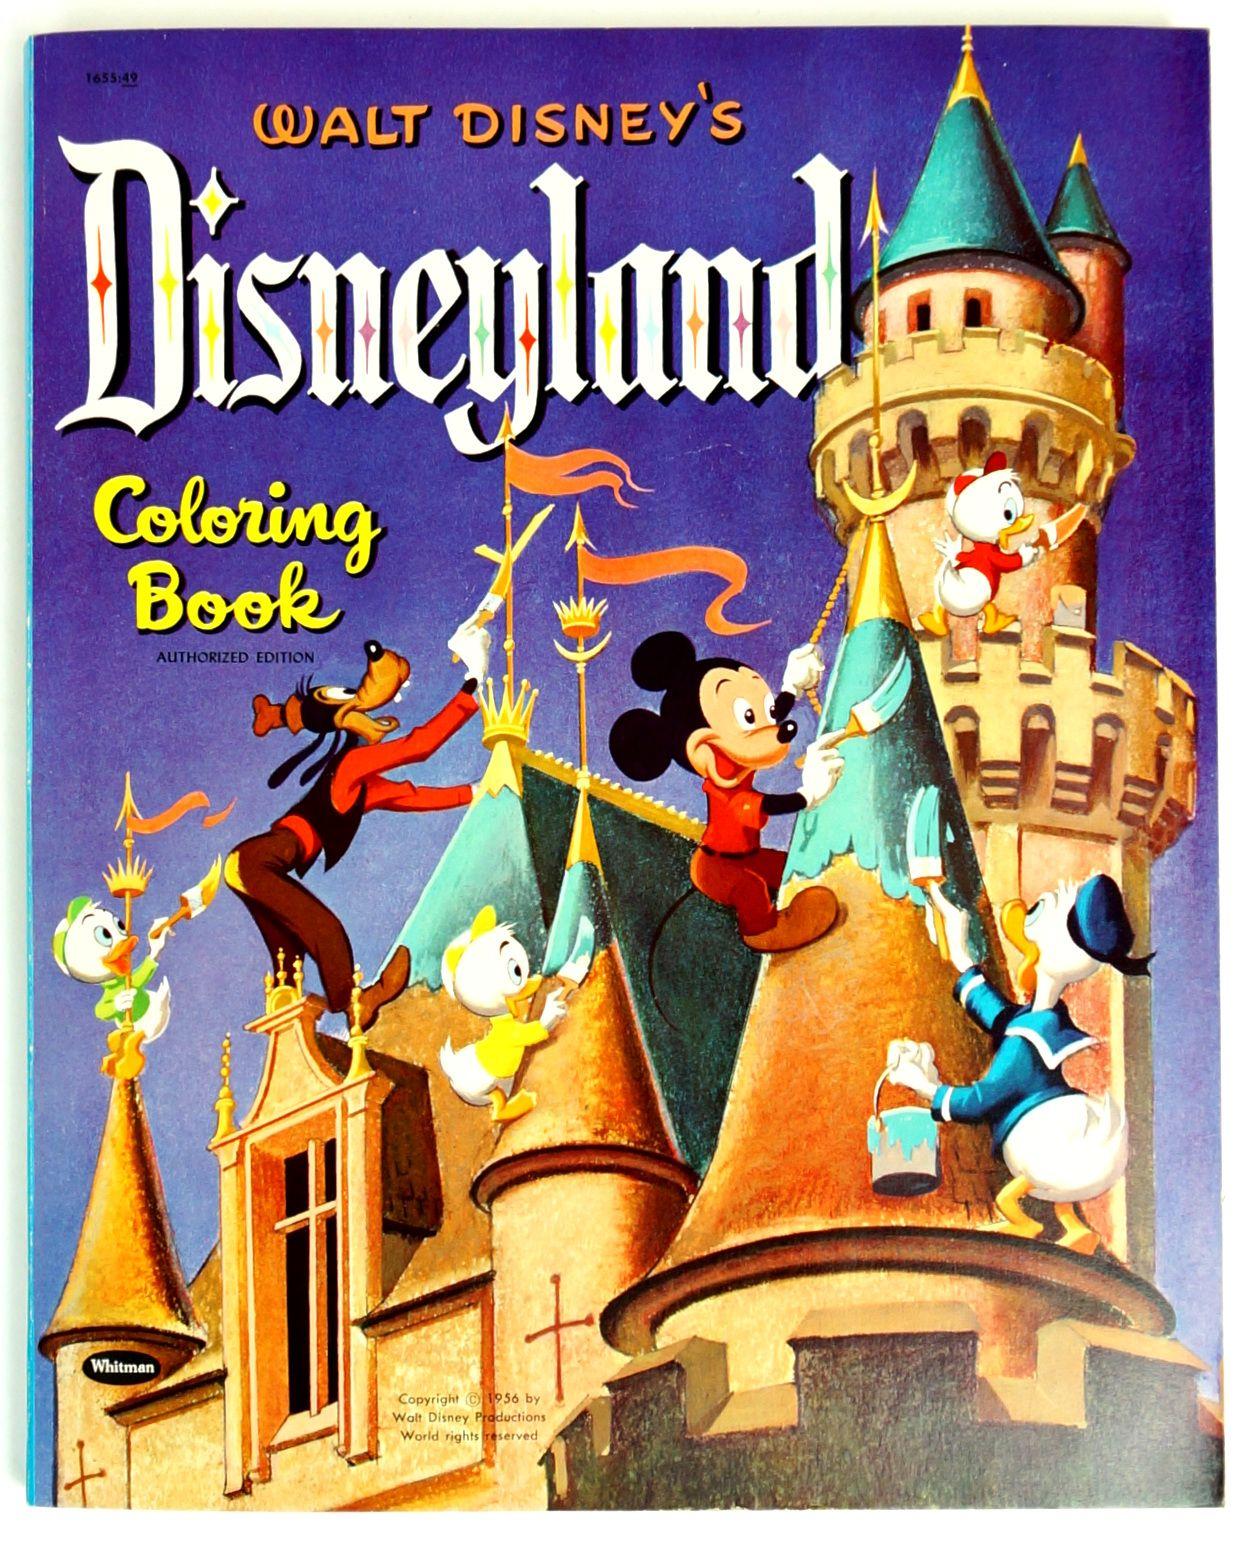 Rare Walt Disneys Disneyland Coloring Book 1956 VGC